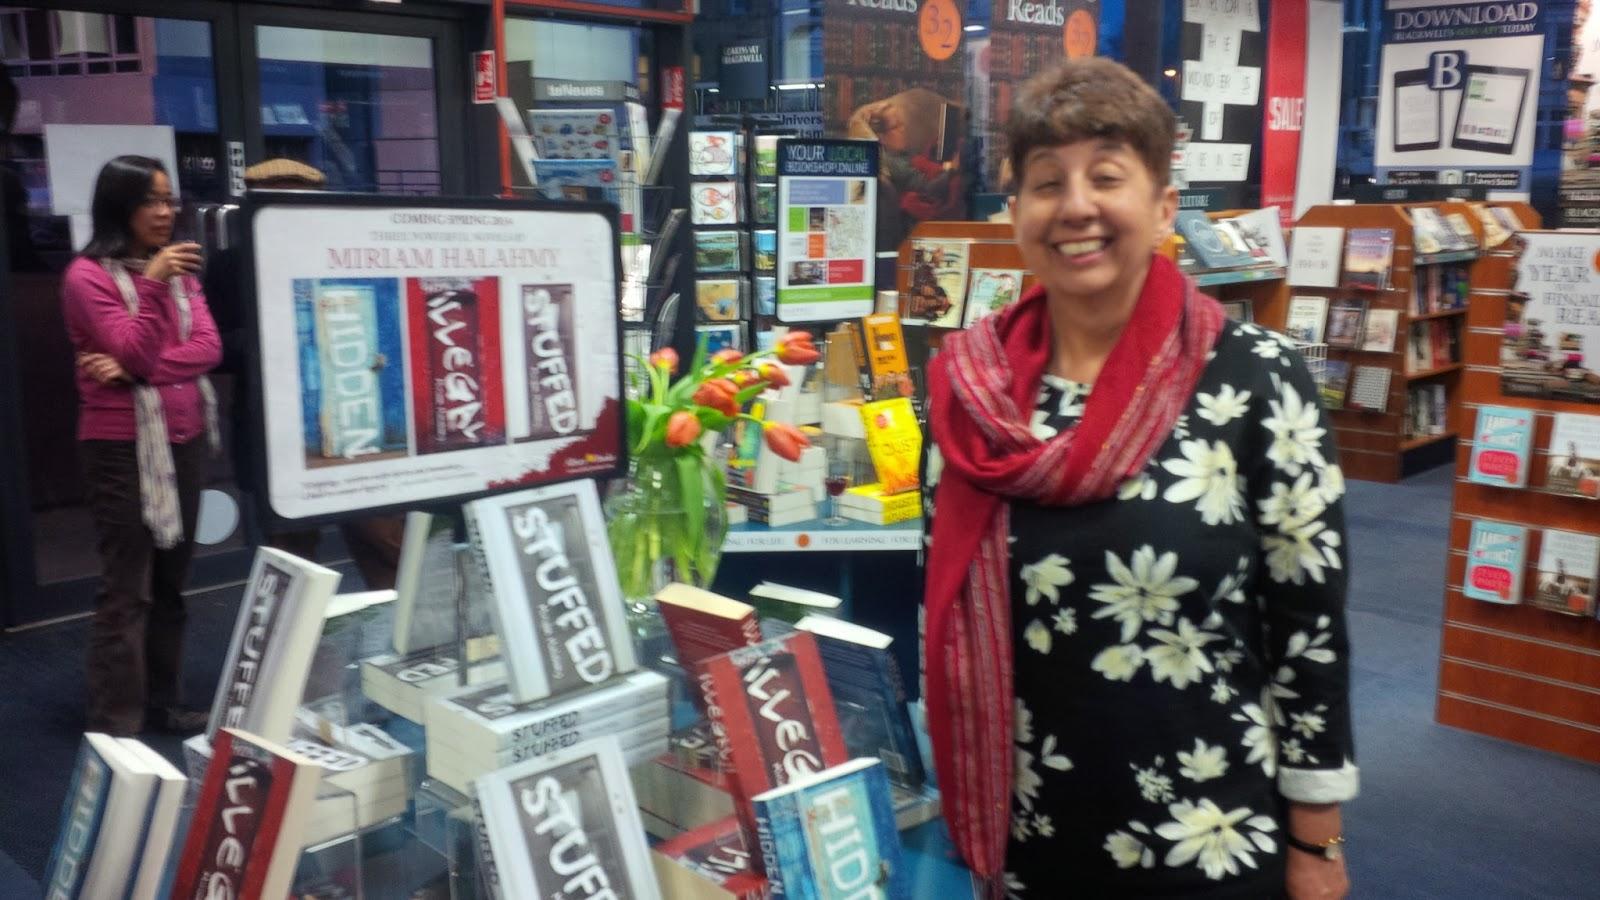 Miriam Halahmy Stuffed Albury Books